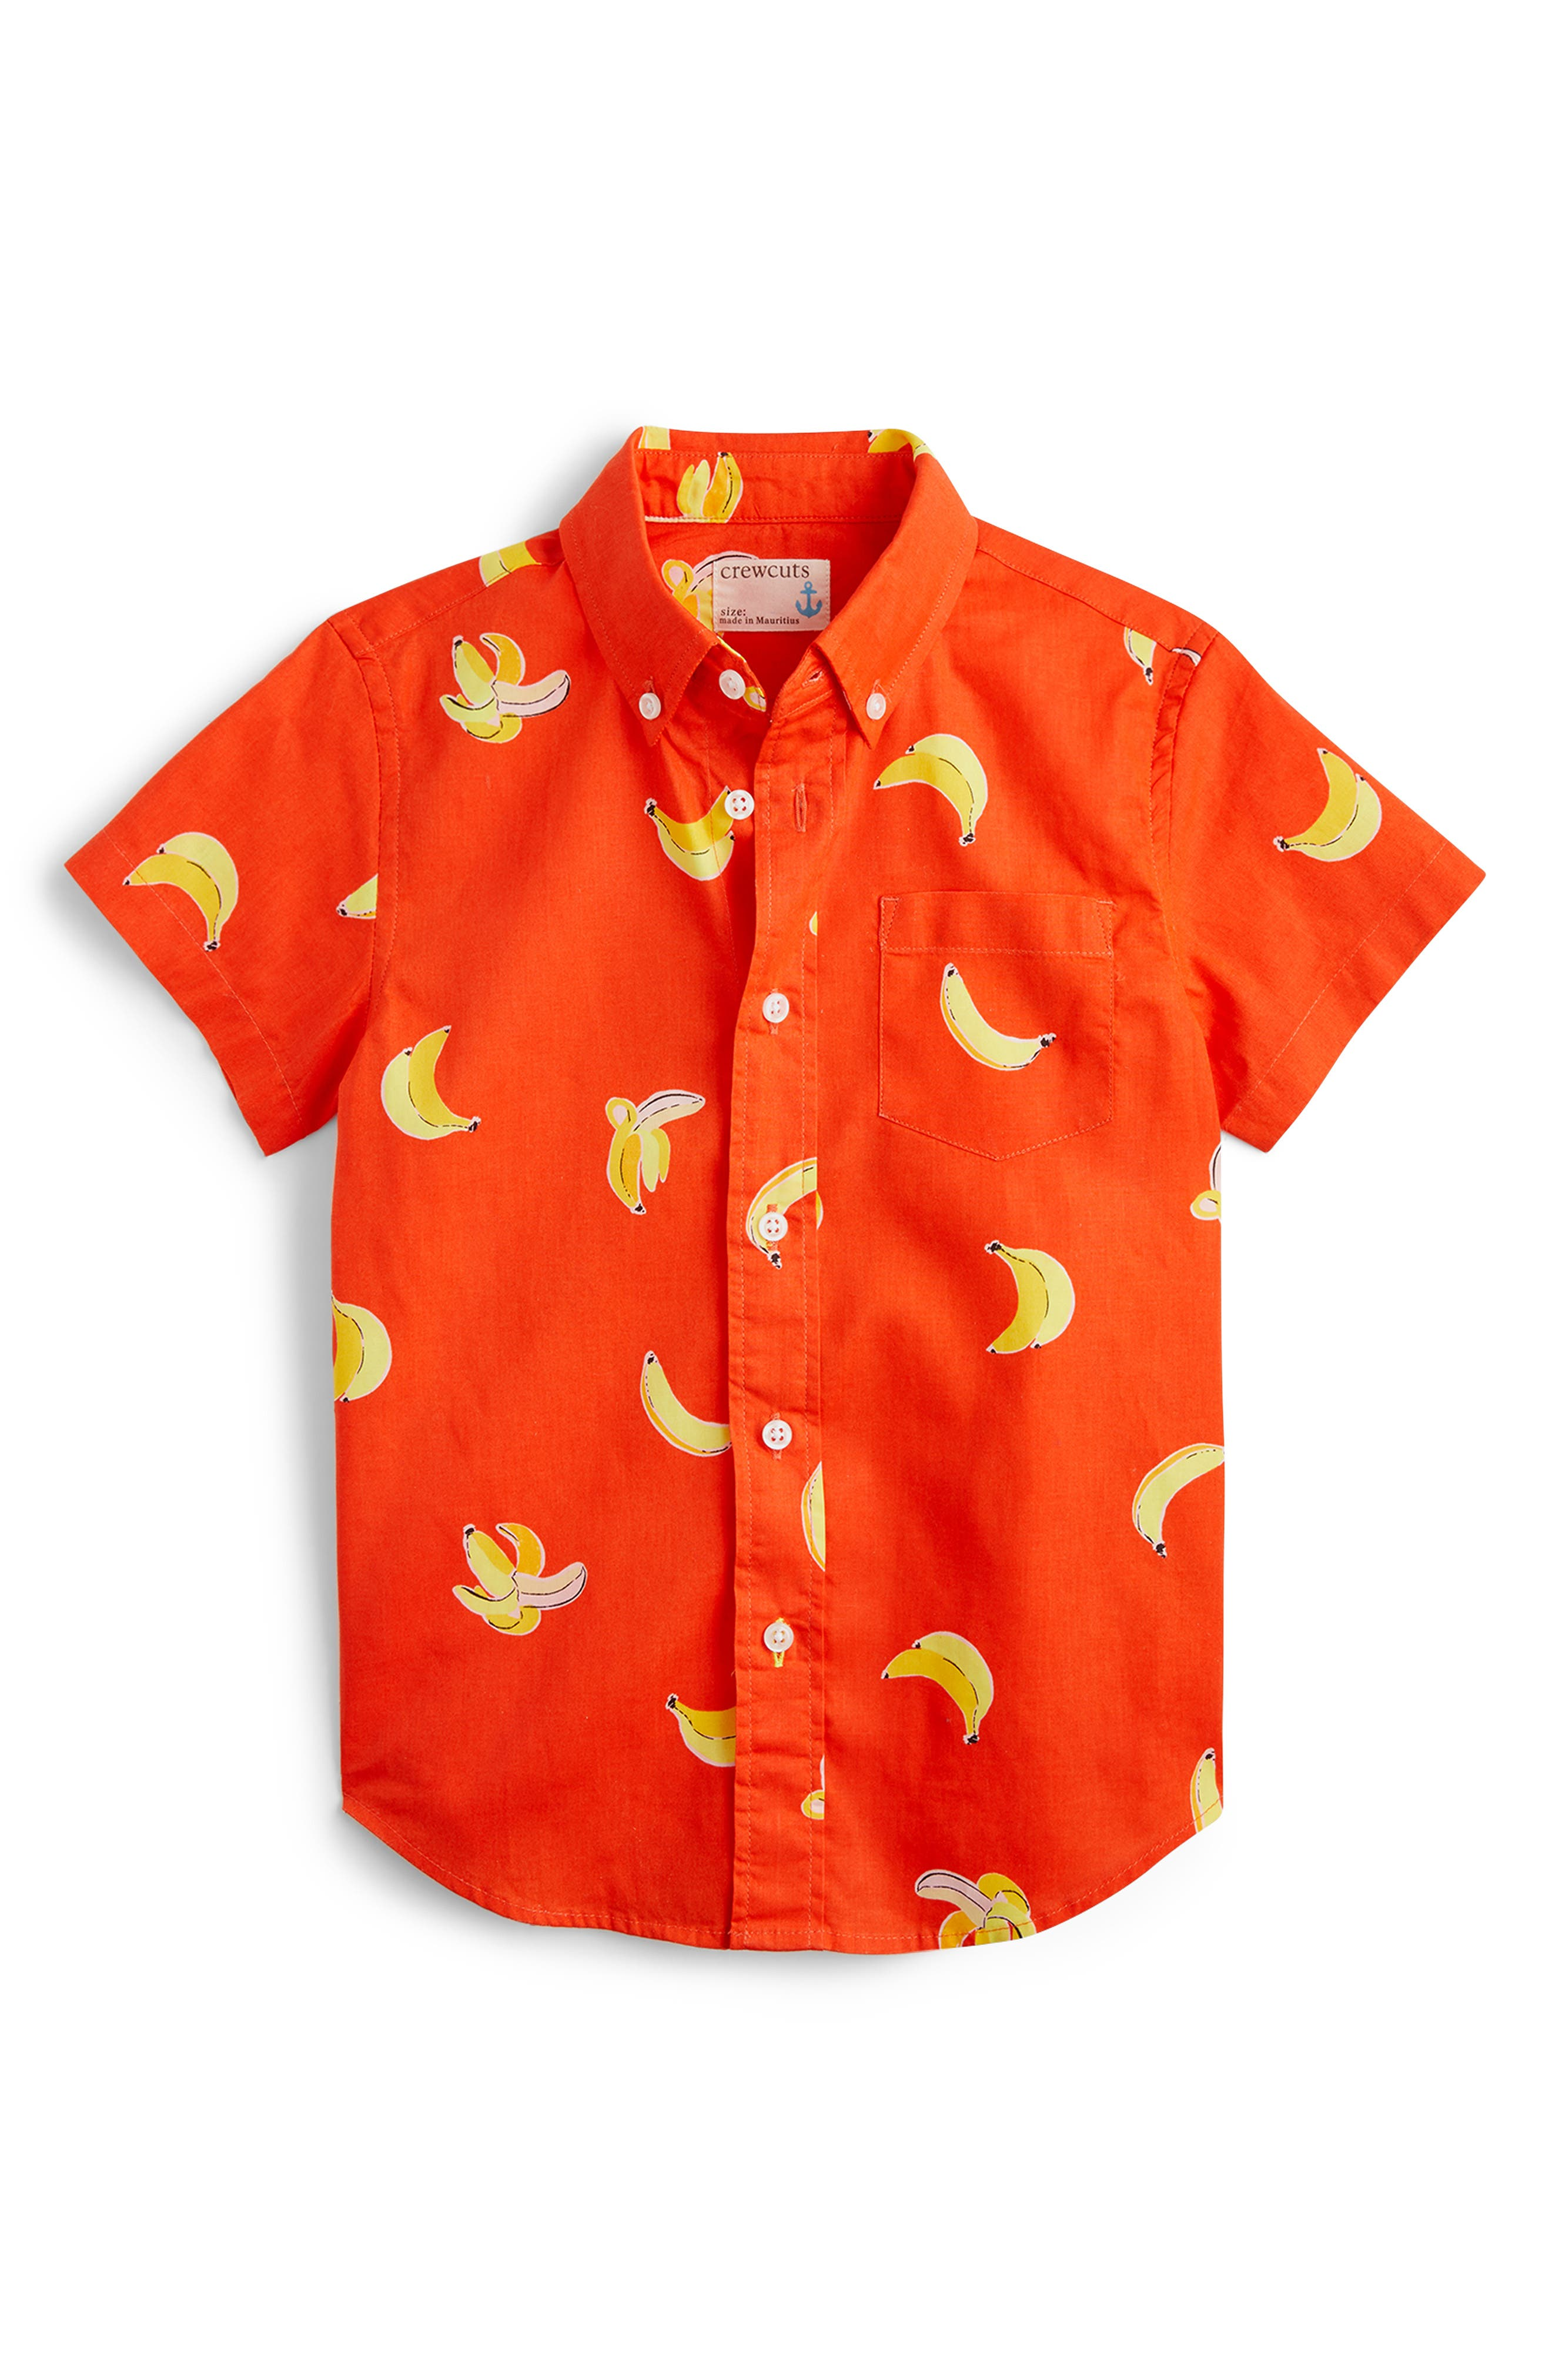 Boys Crewcuts By Jcrew Bananas Stretch Poplin ButtonDown Shirt Size 45  Red